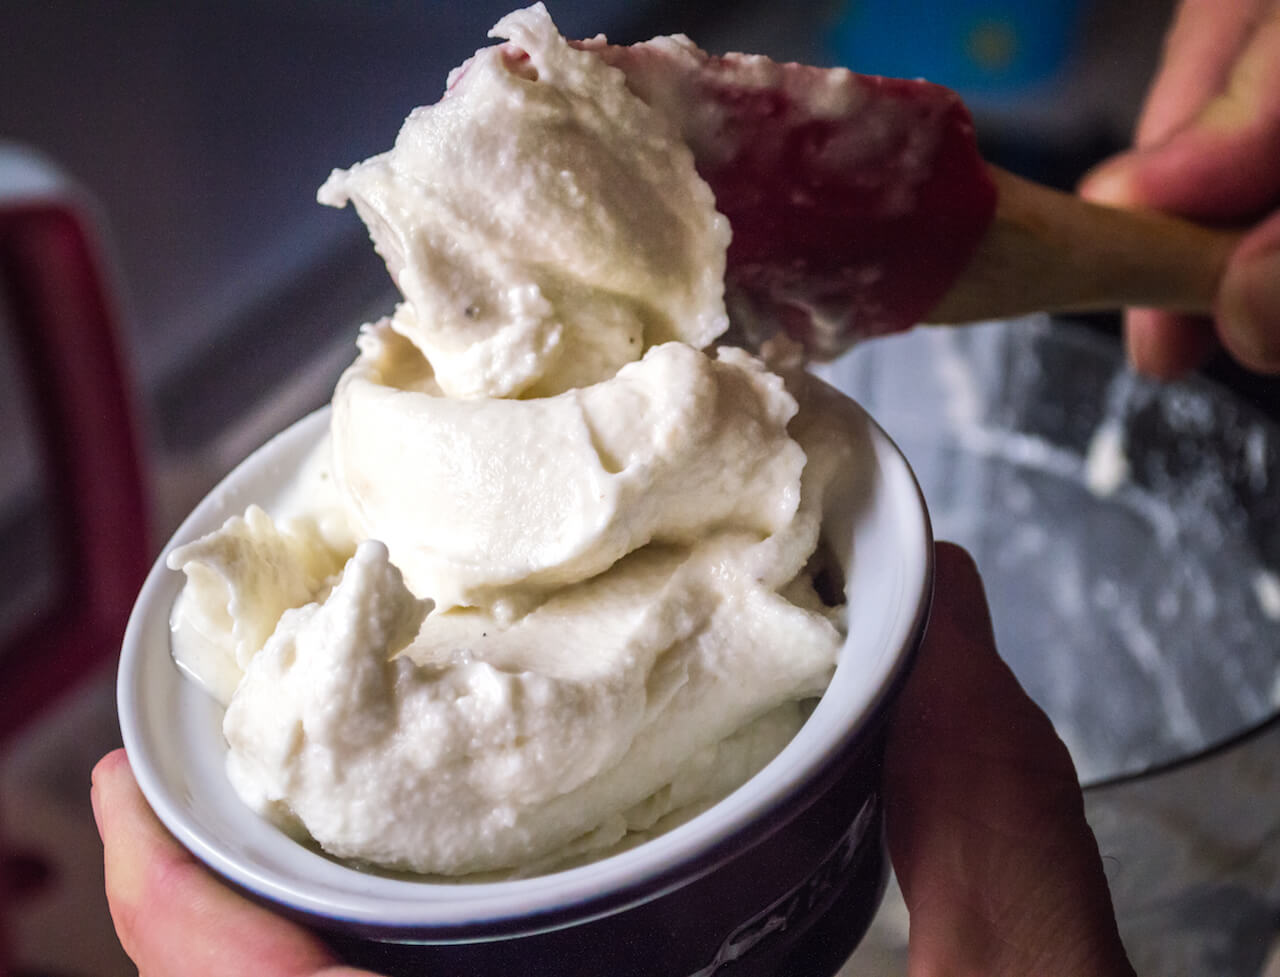 Vanilla Ice Cream made in a Bag